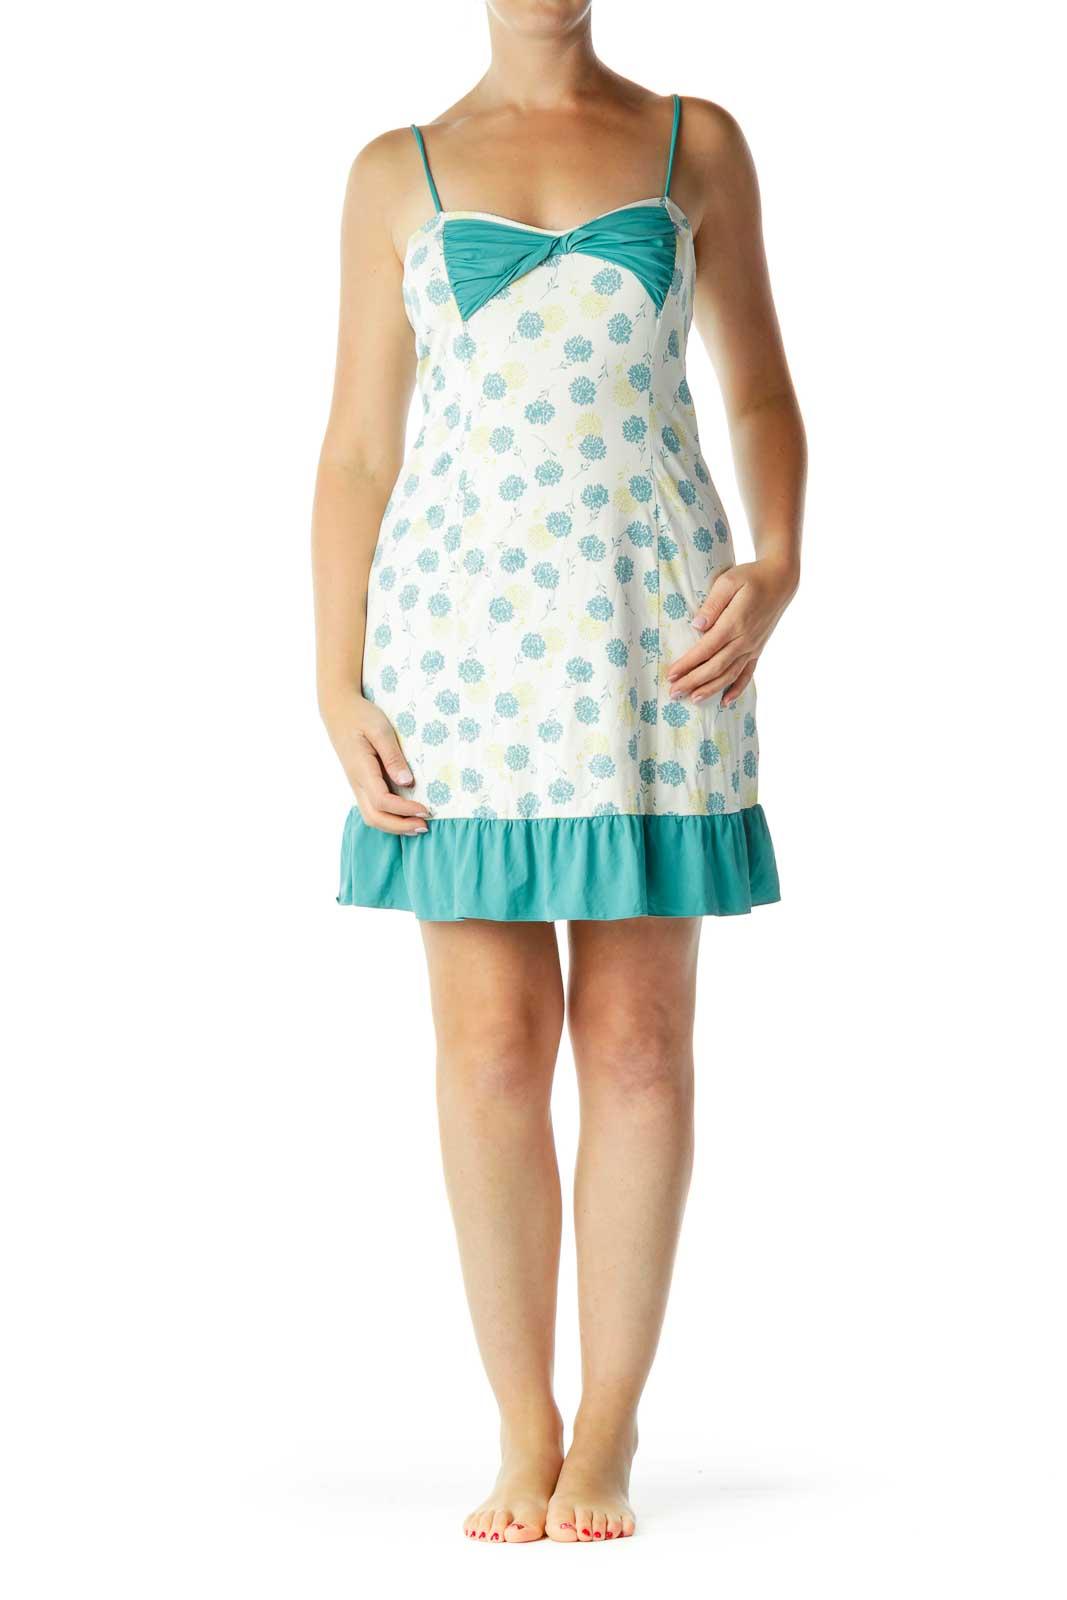 Cream Teal Floral Bow Detailed Slip Dress